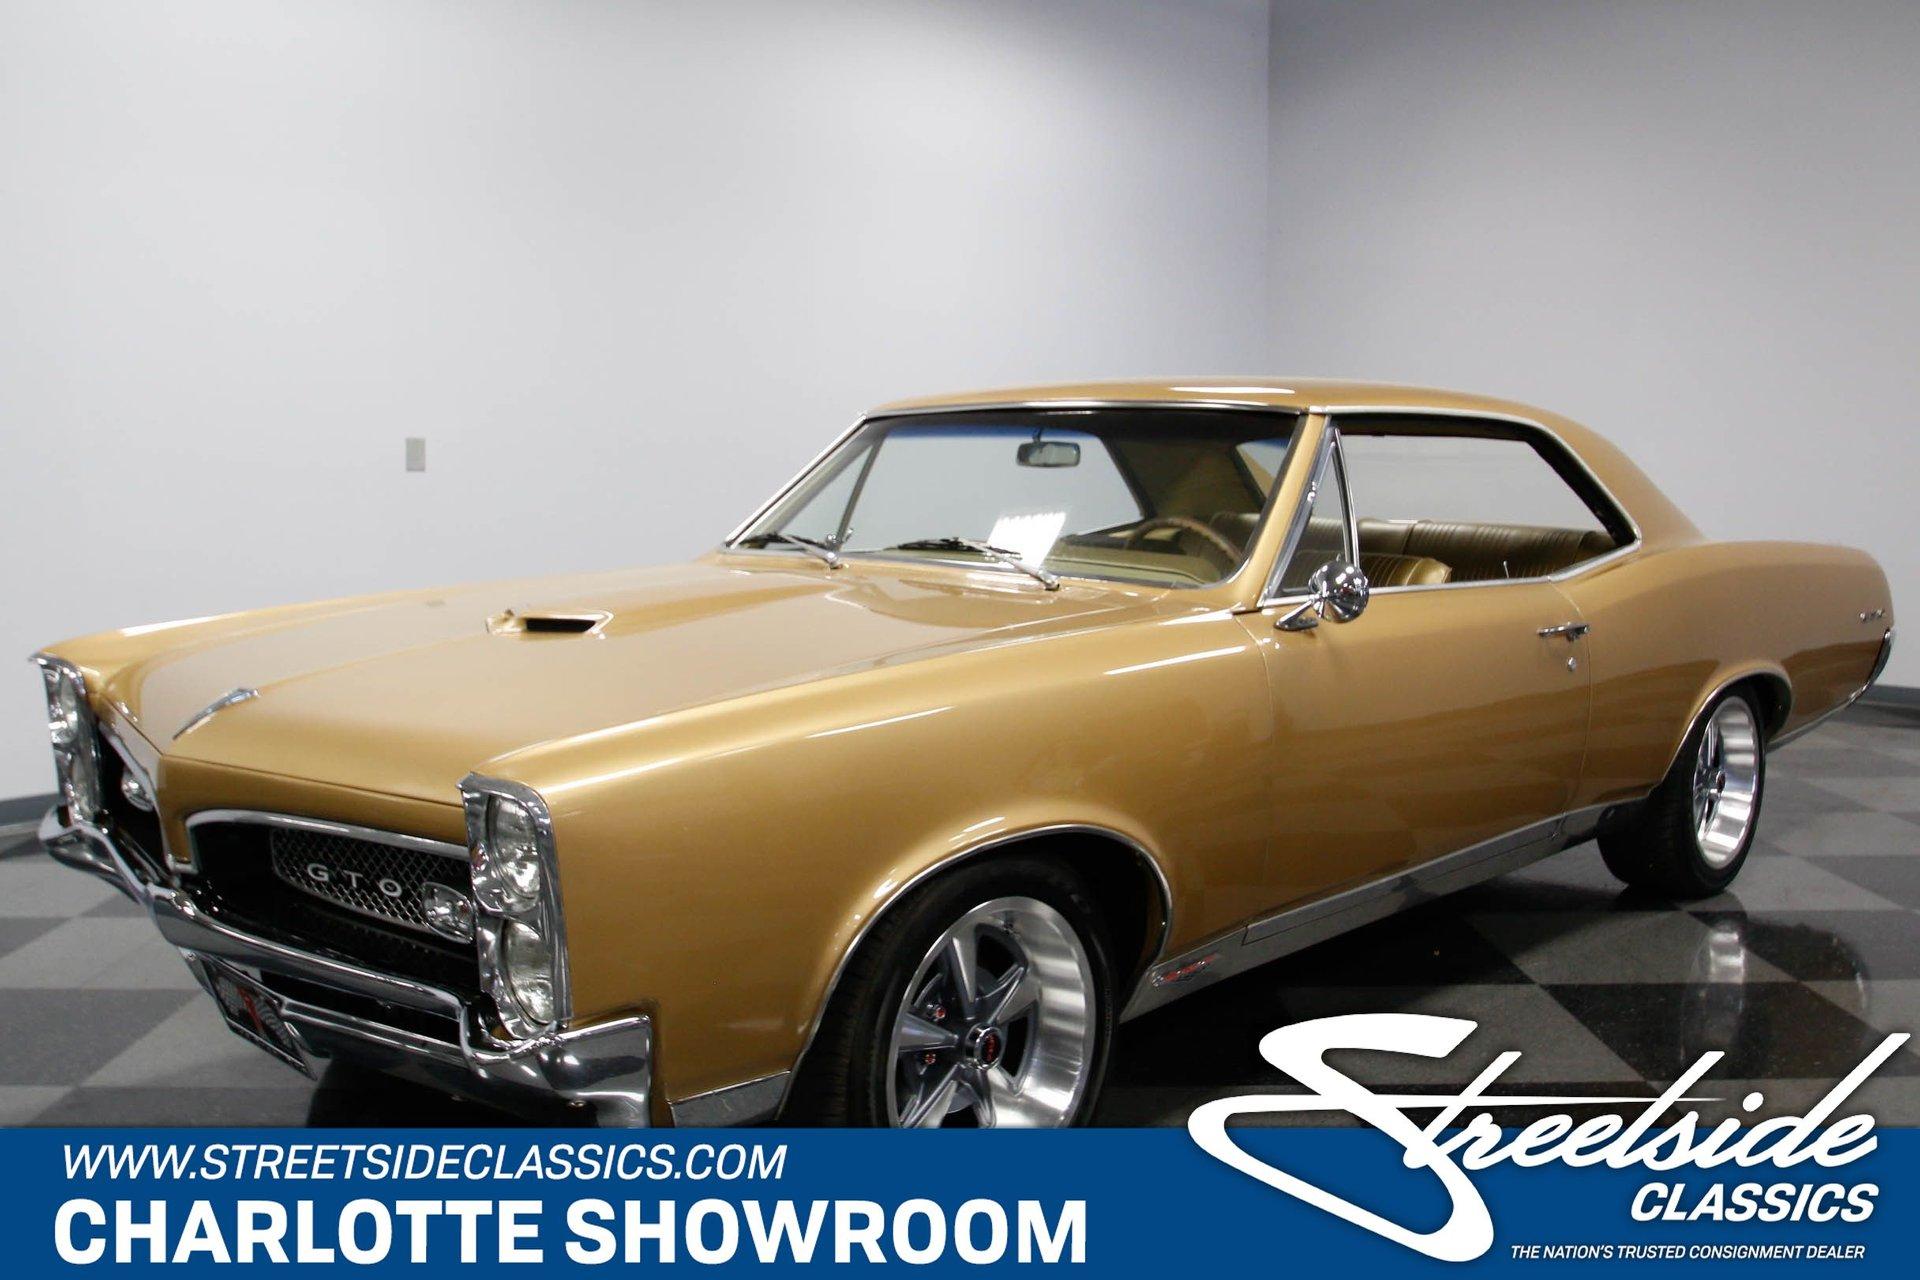 1967 Pontiac GTO   Streetside Classics - The Nation's